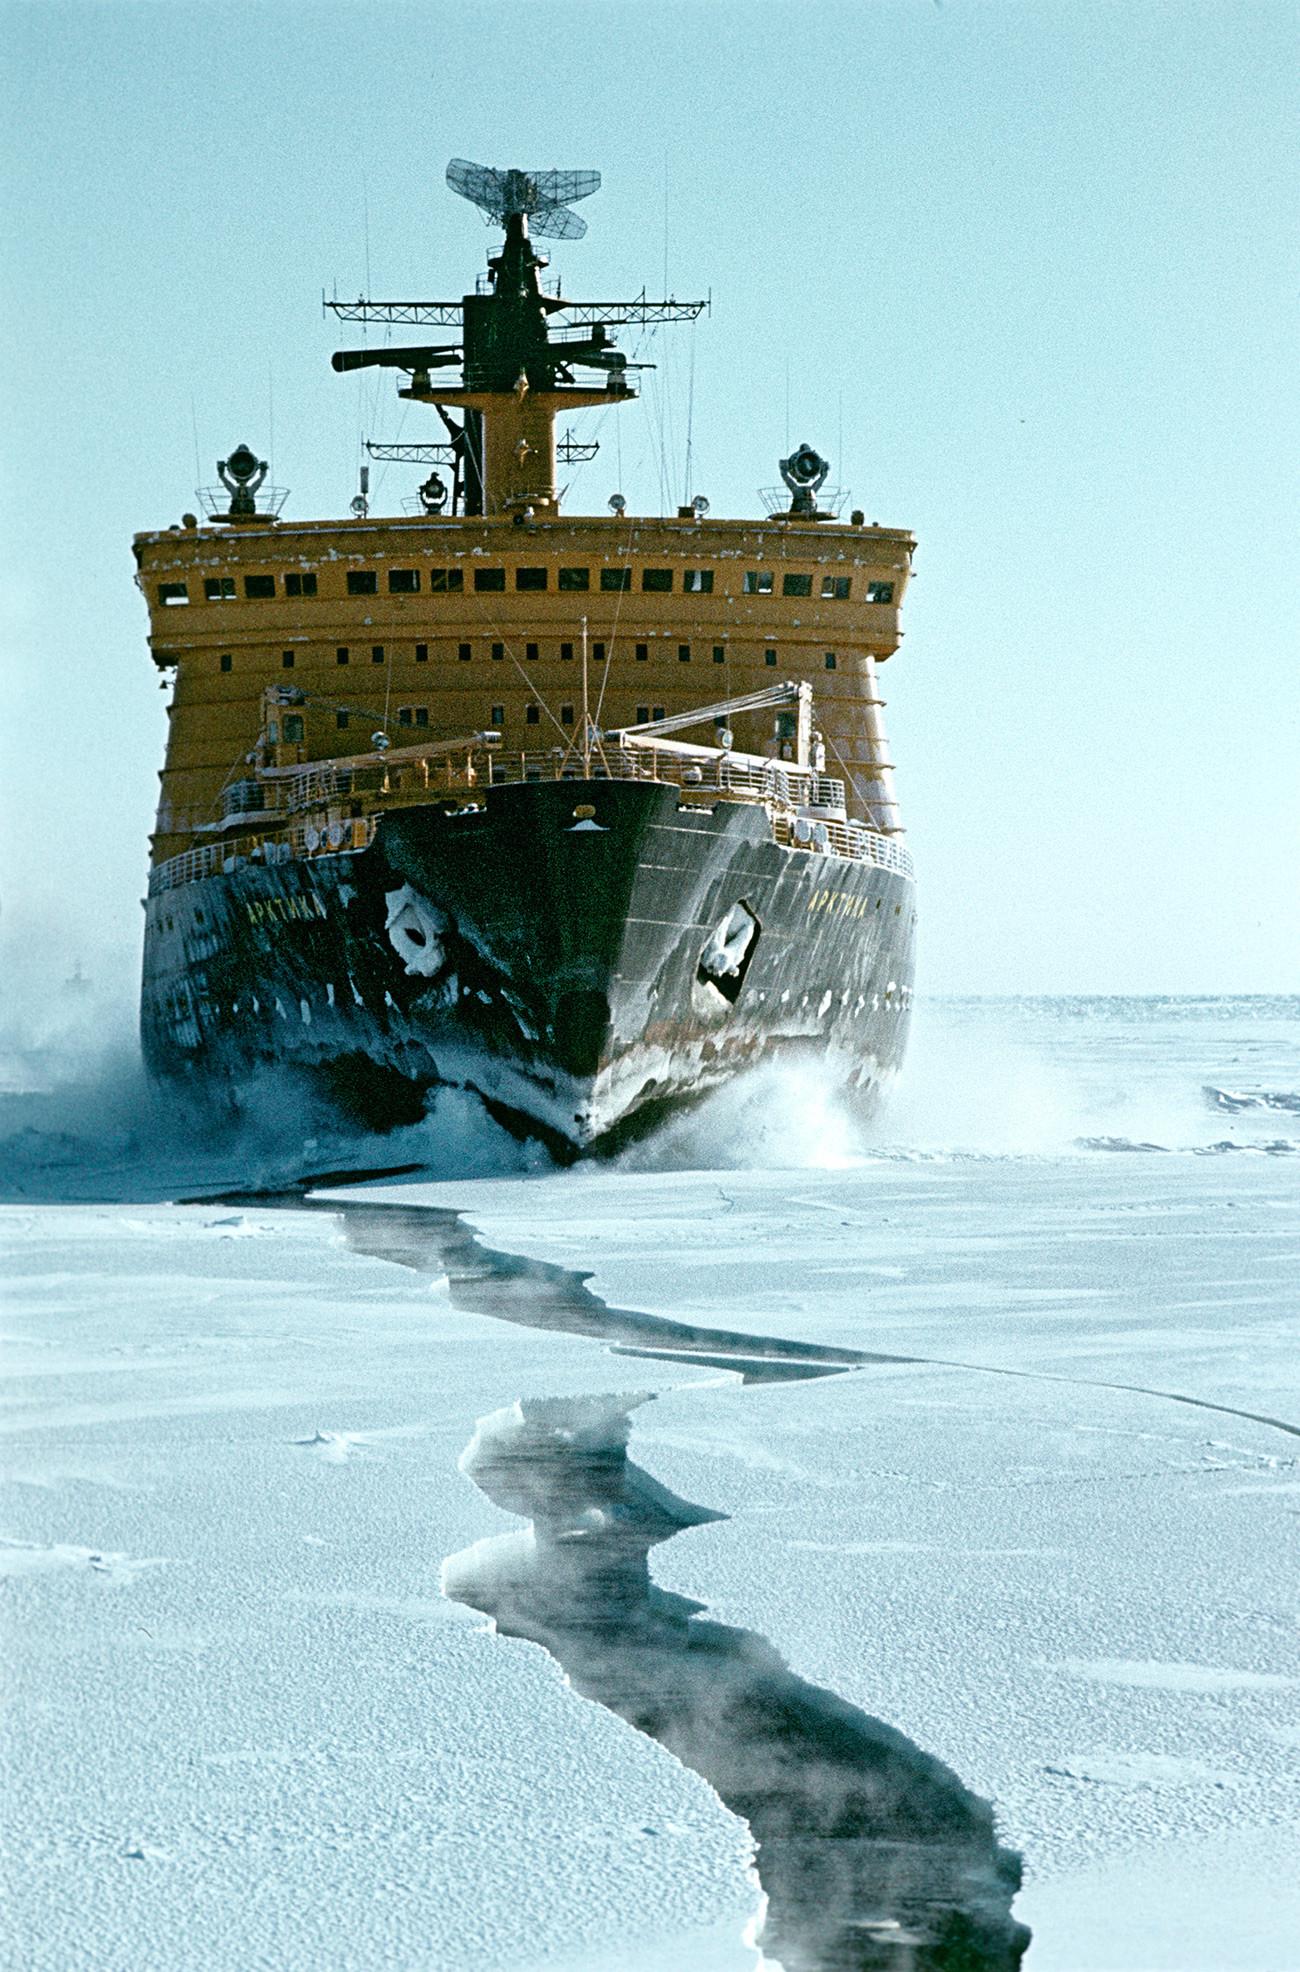 Rompehielos nuclear Árktika (Ártico).